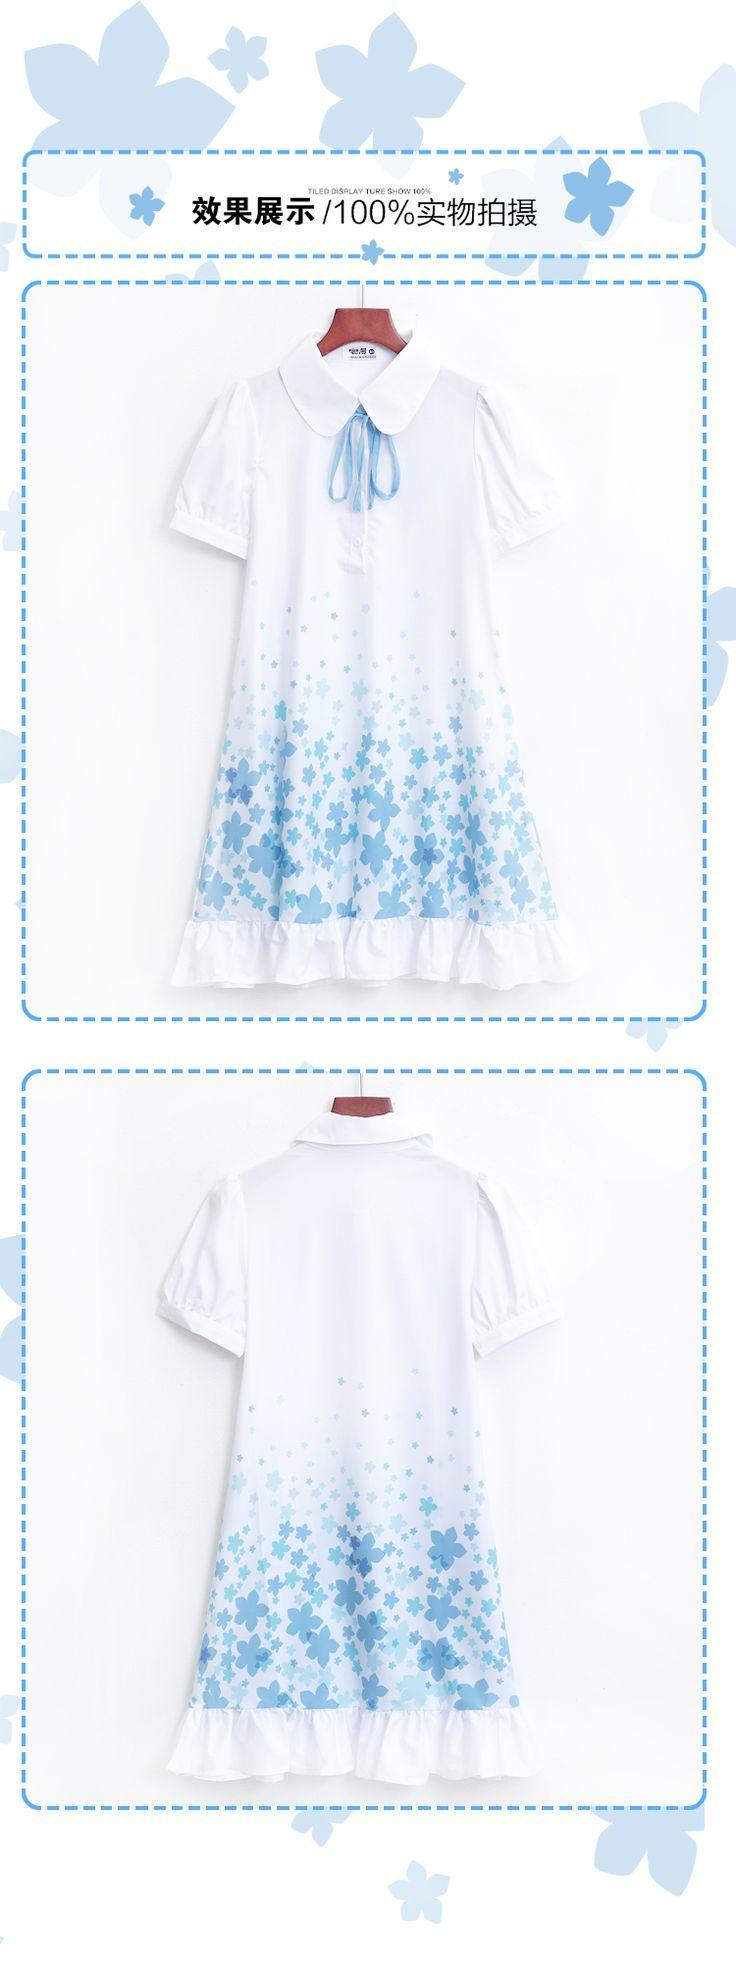 Spot House Man unheard nickname / flower Unnamed / flower / area code impression shirt dress / doll dress anime - Taobao global Station